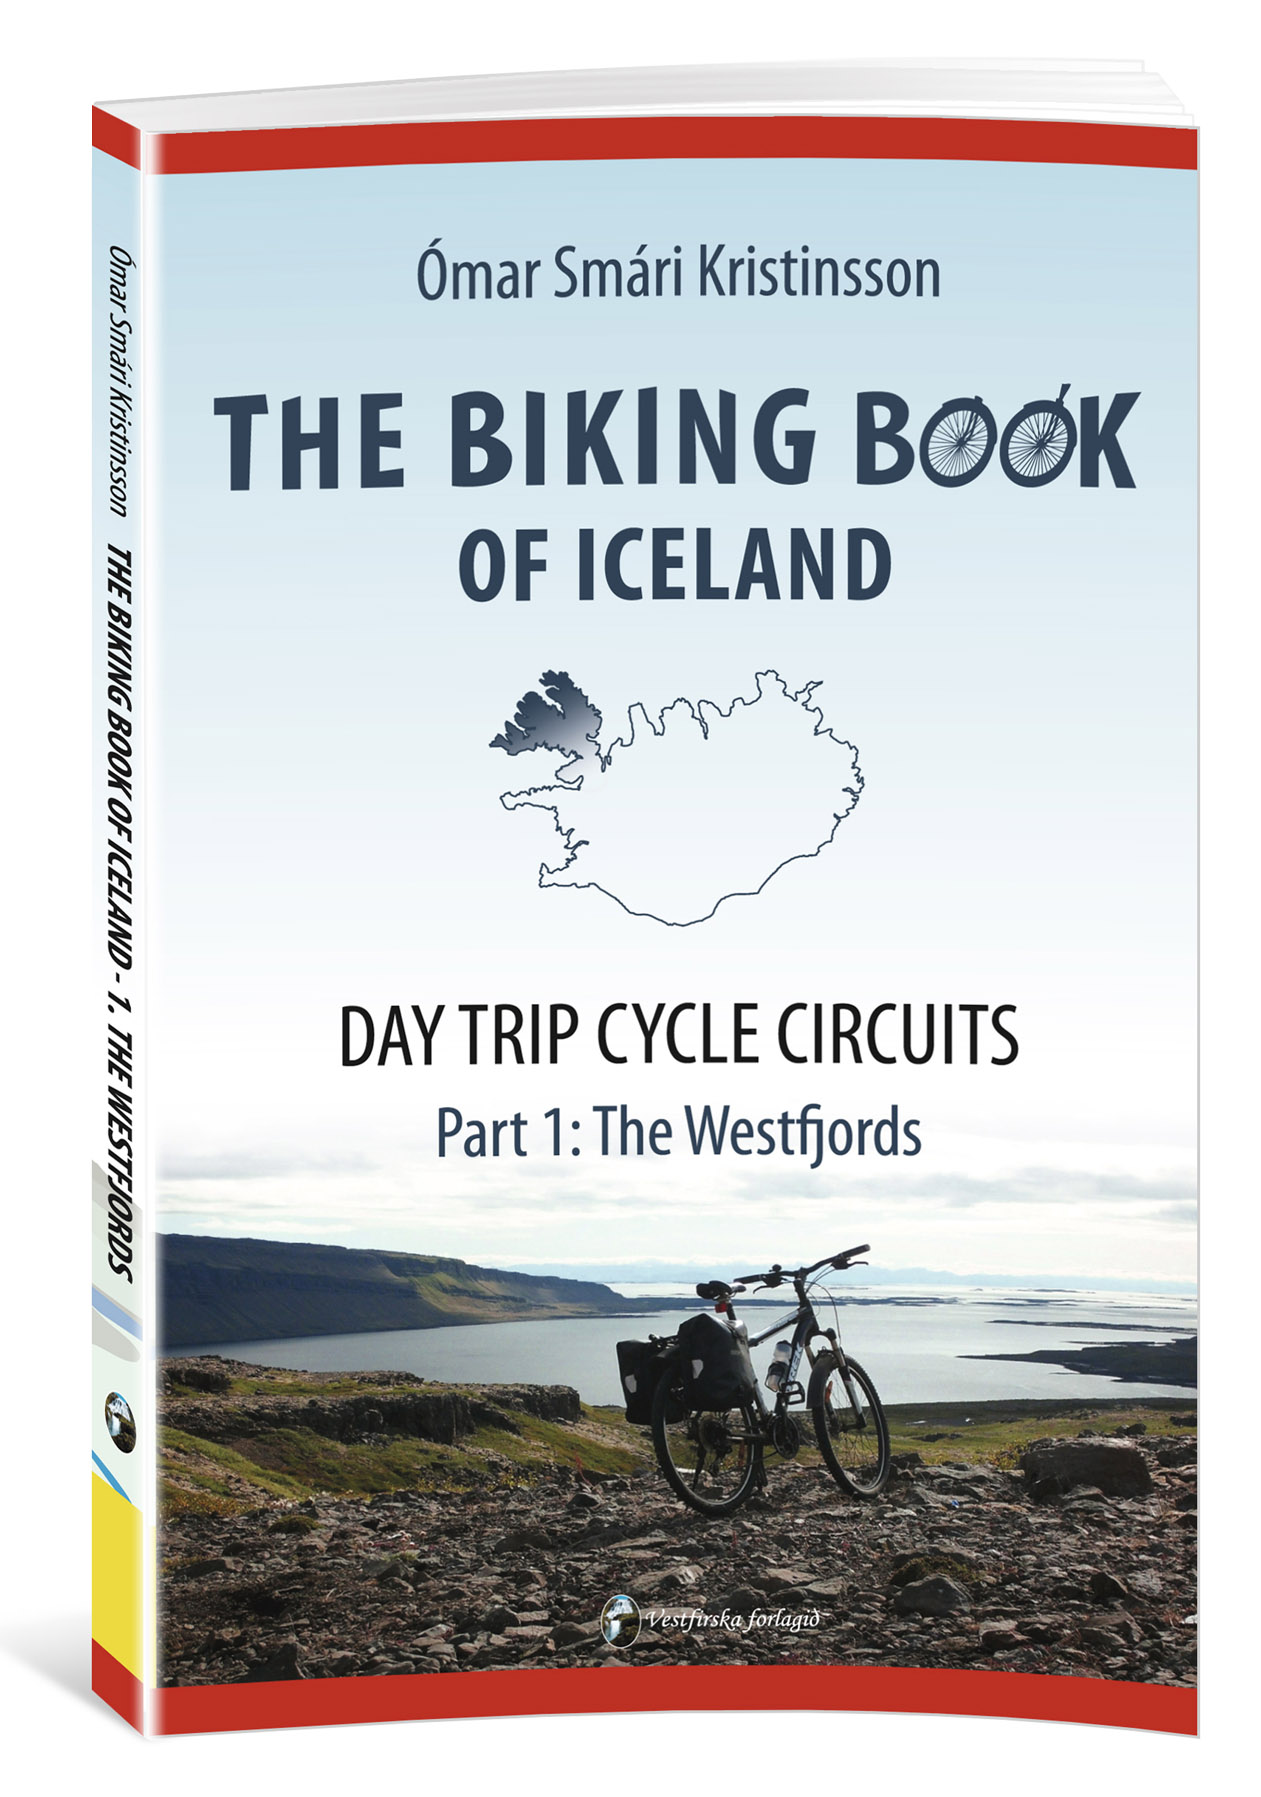 The Biking Book of Iceland